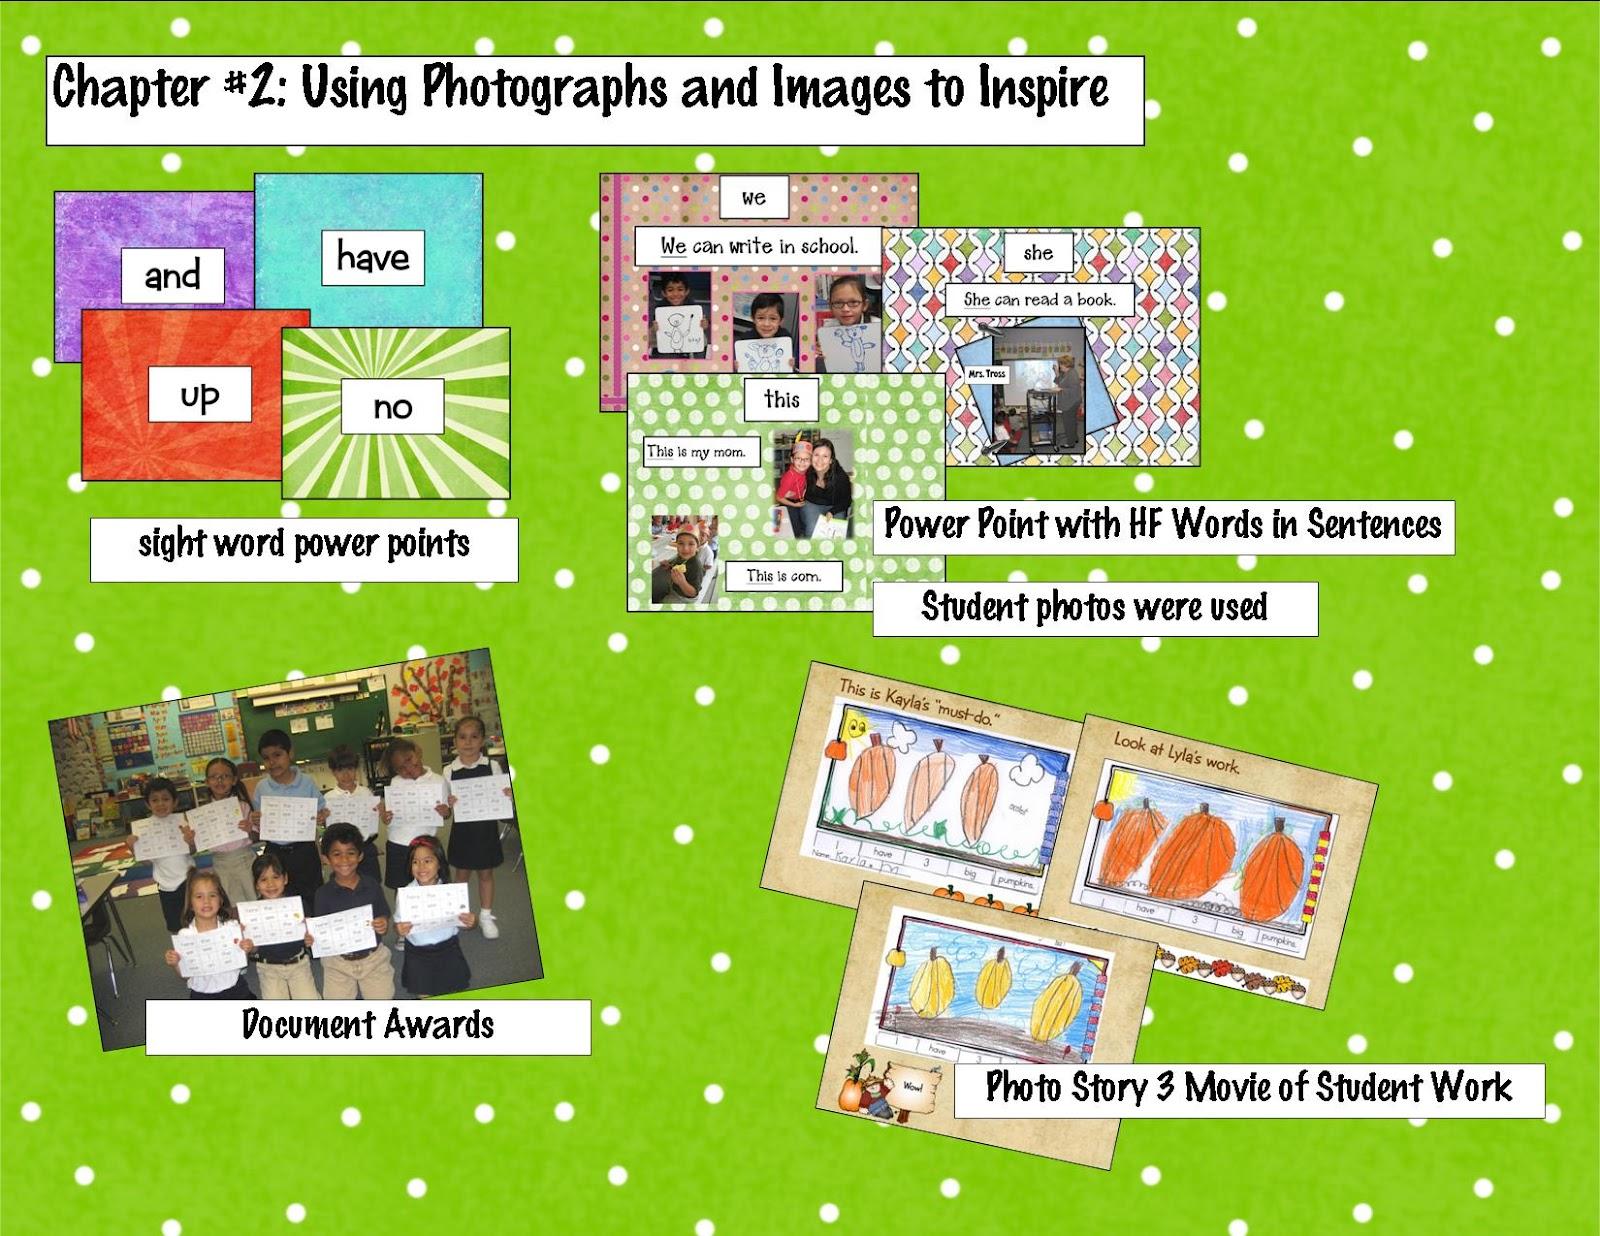 Kindergarten Crayons I Am All Over Digital Photography